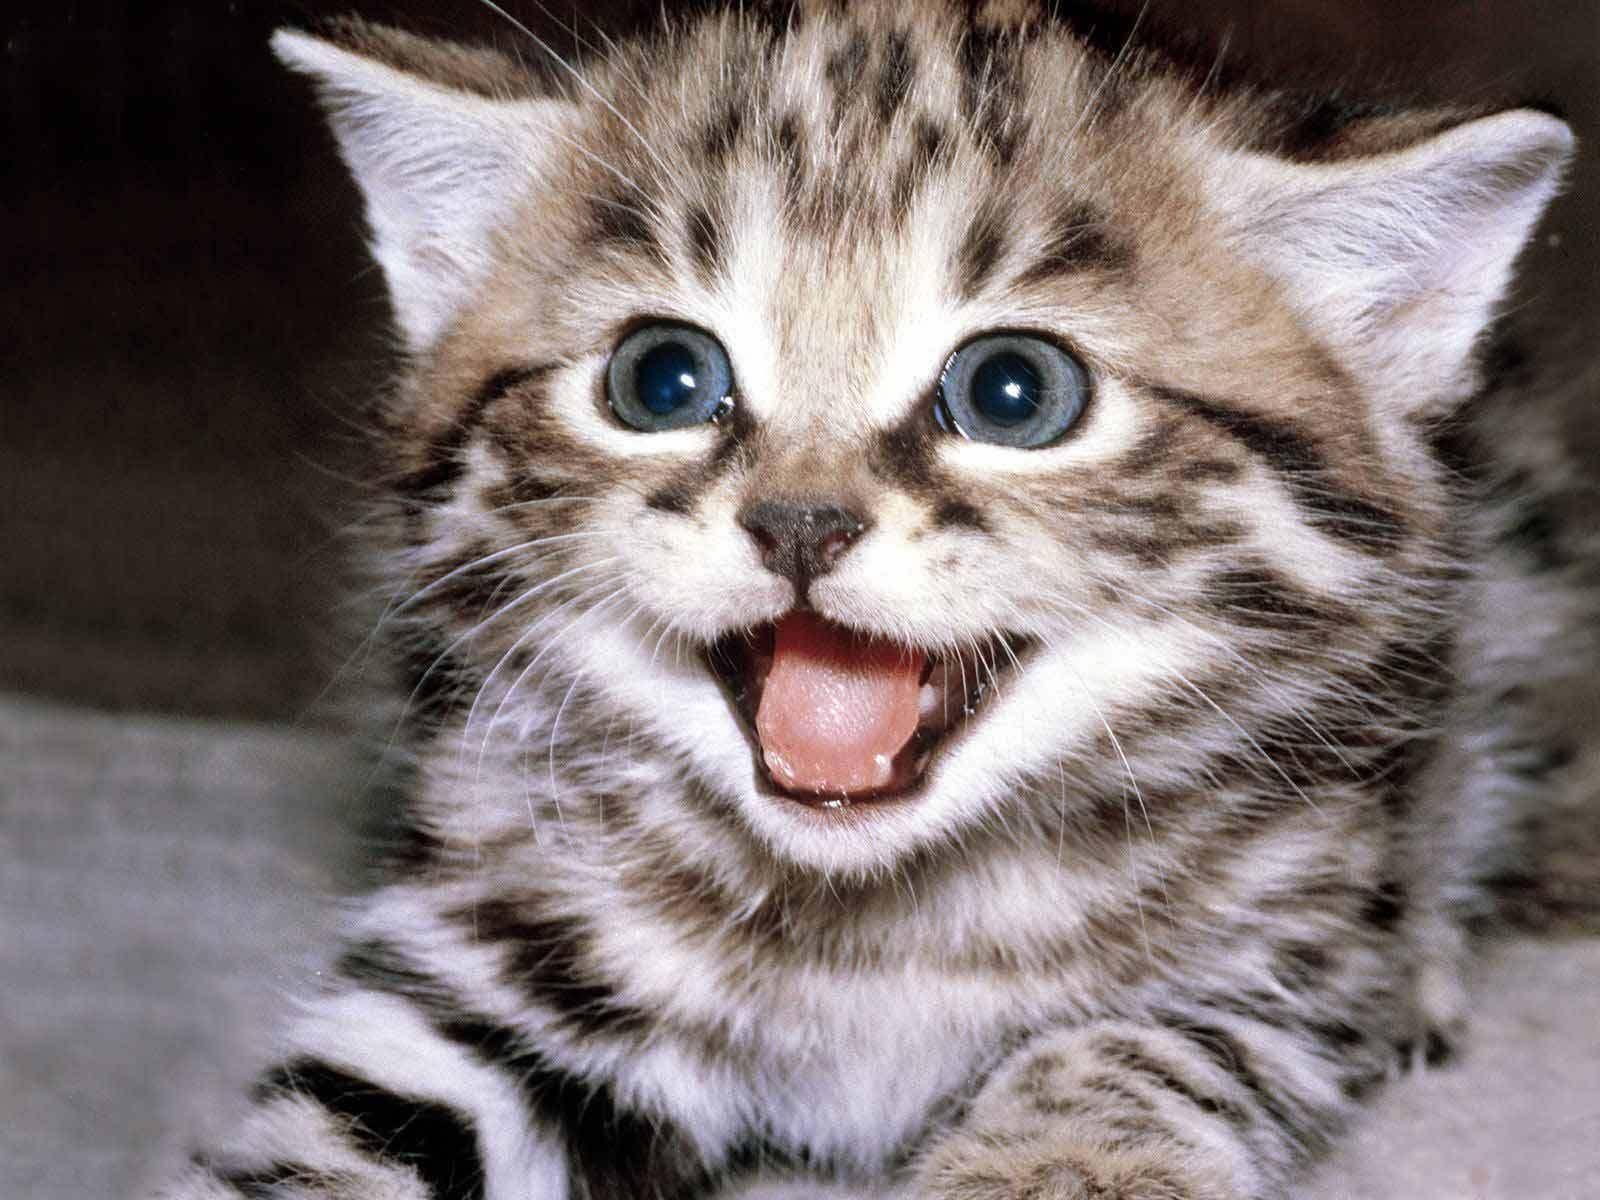 How Do I Look Like P Innocent Beautiful Kittens Smile Loveit Kittens Cutest Funny Cat Wallpaper Happy Kitten